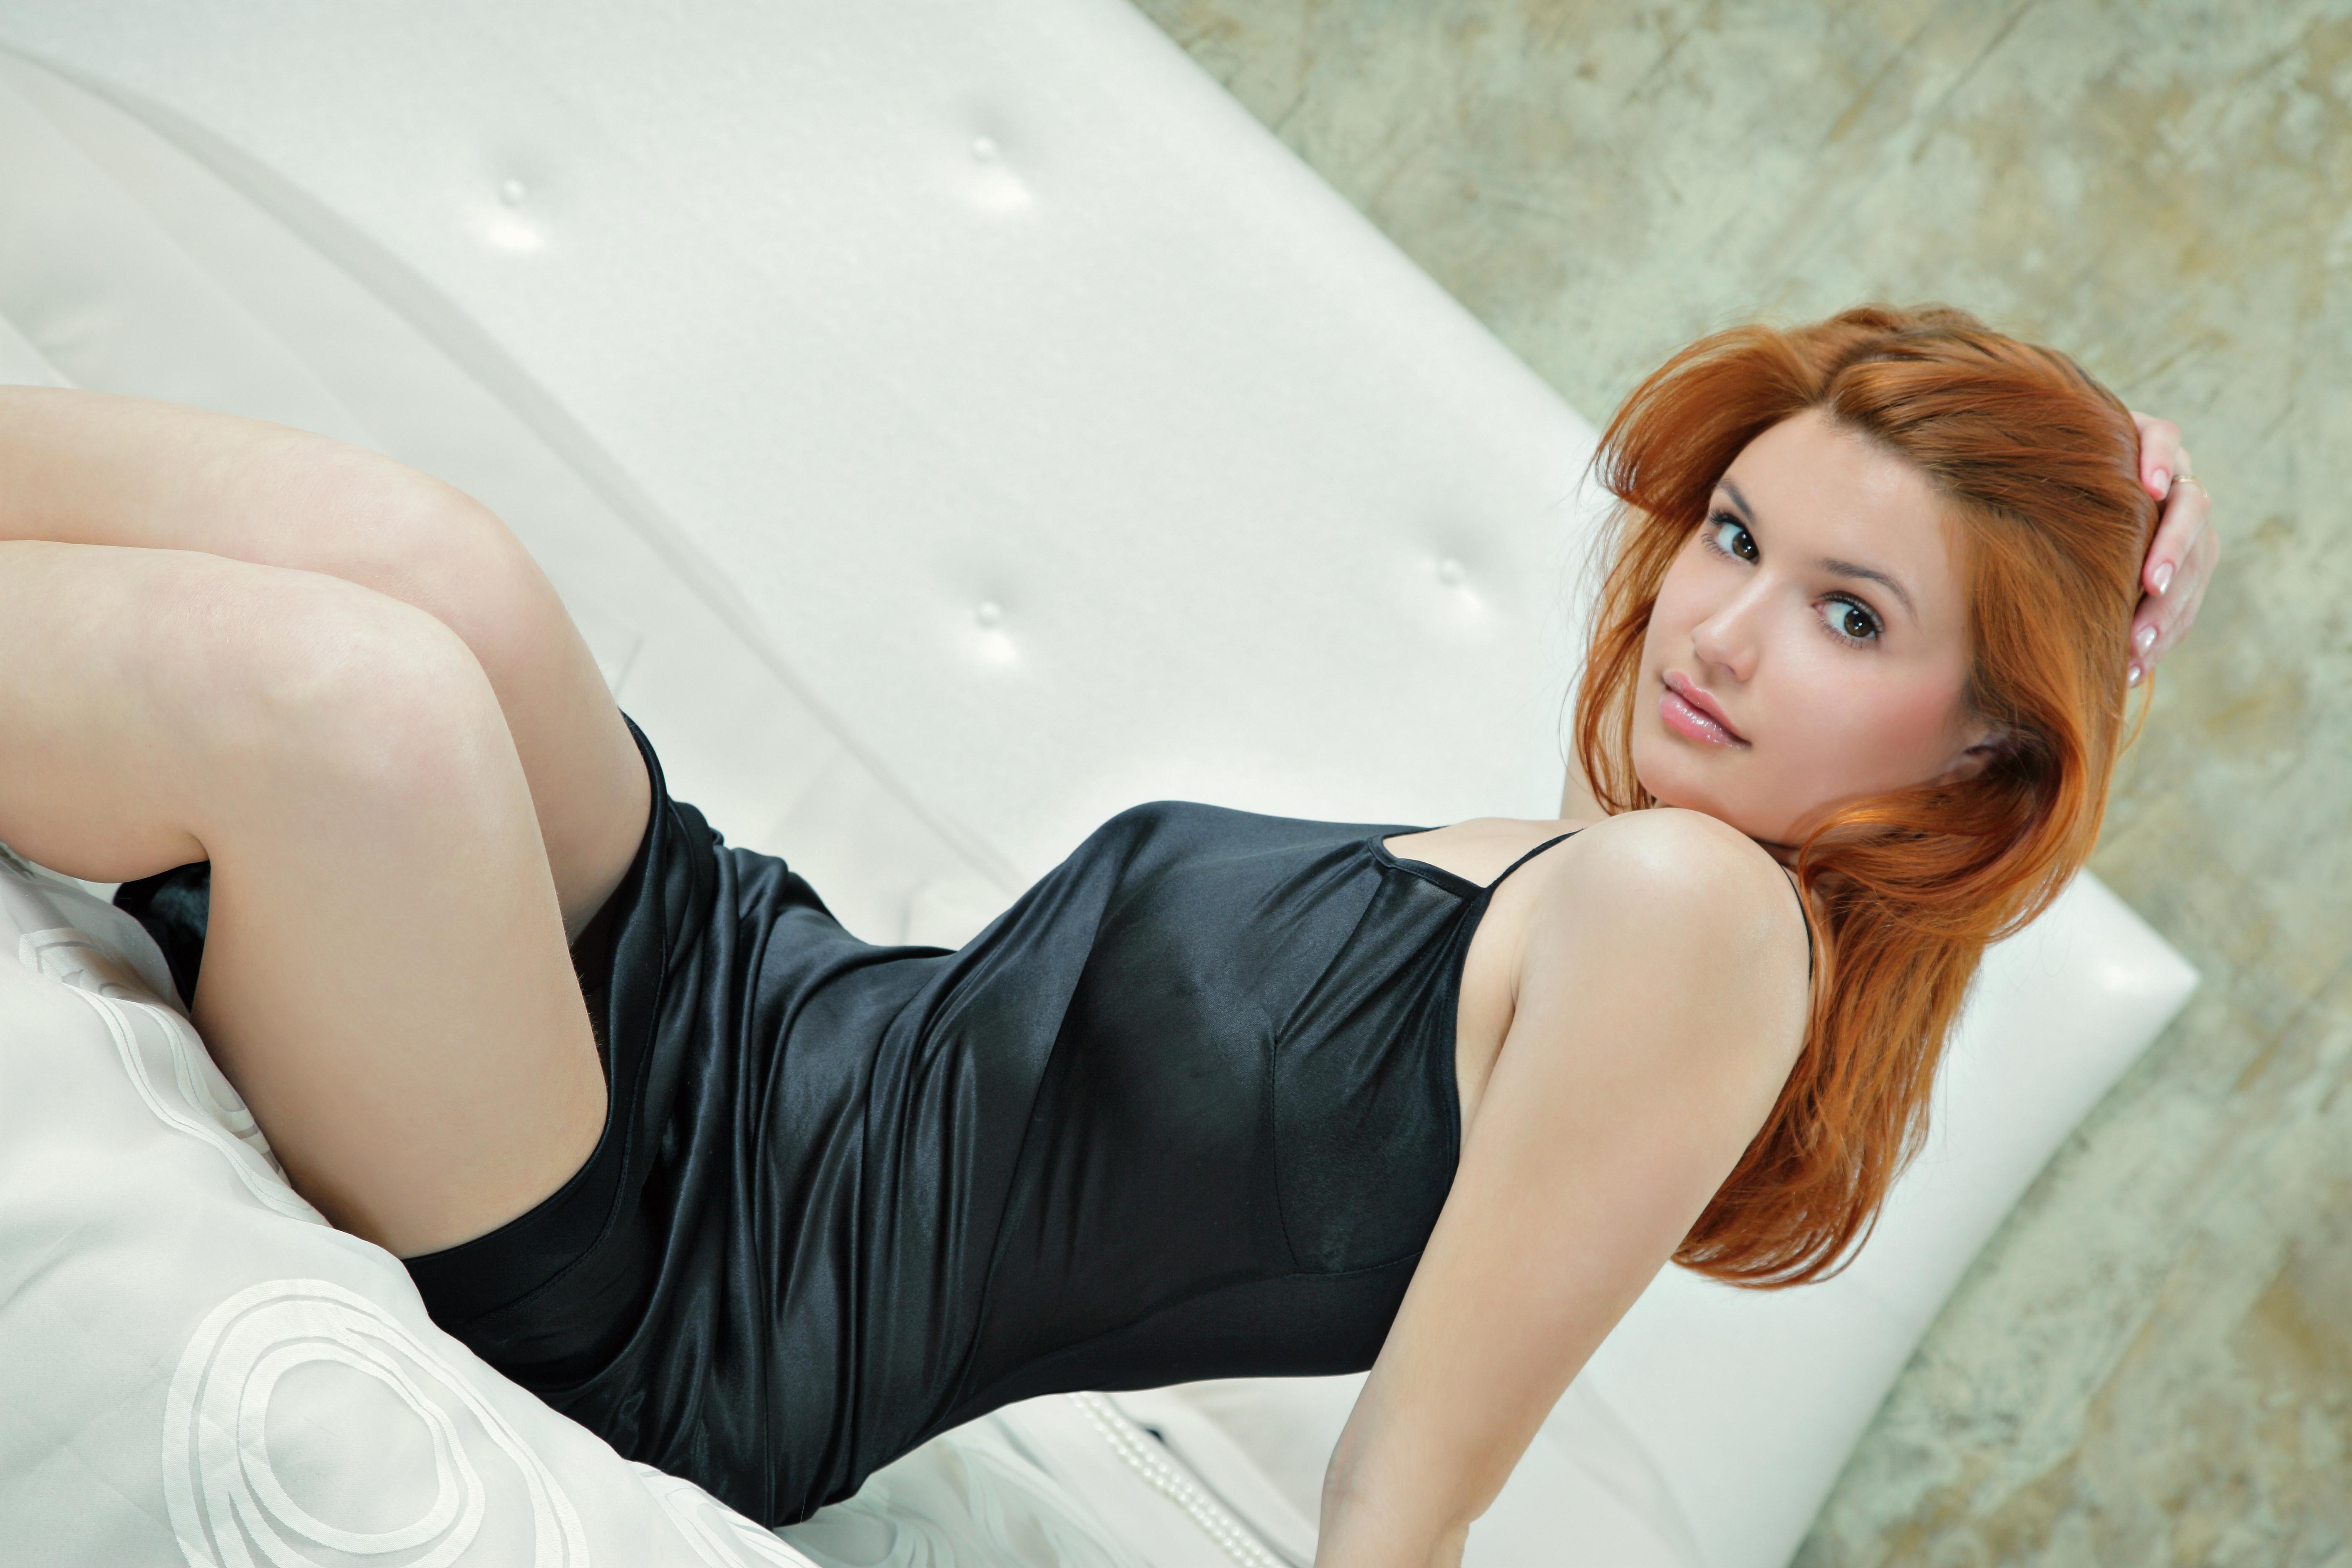 Kylie monogue nude